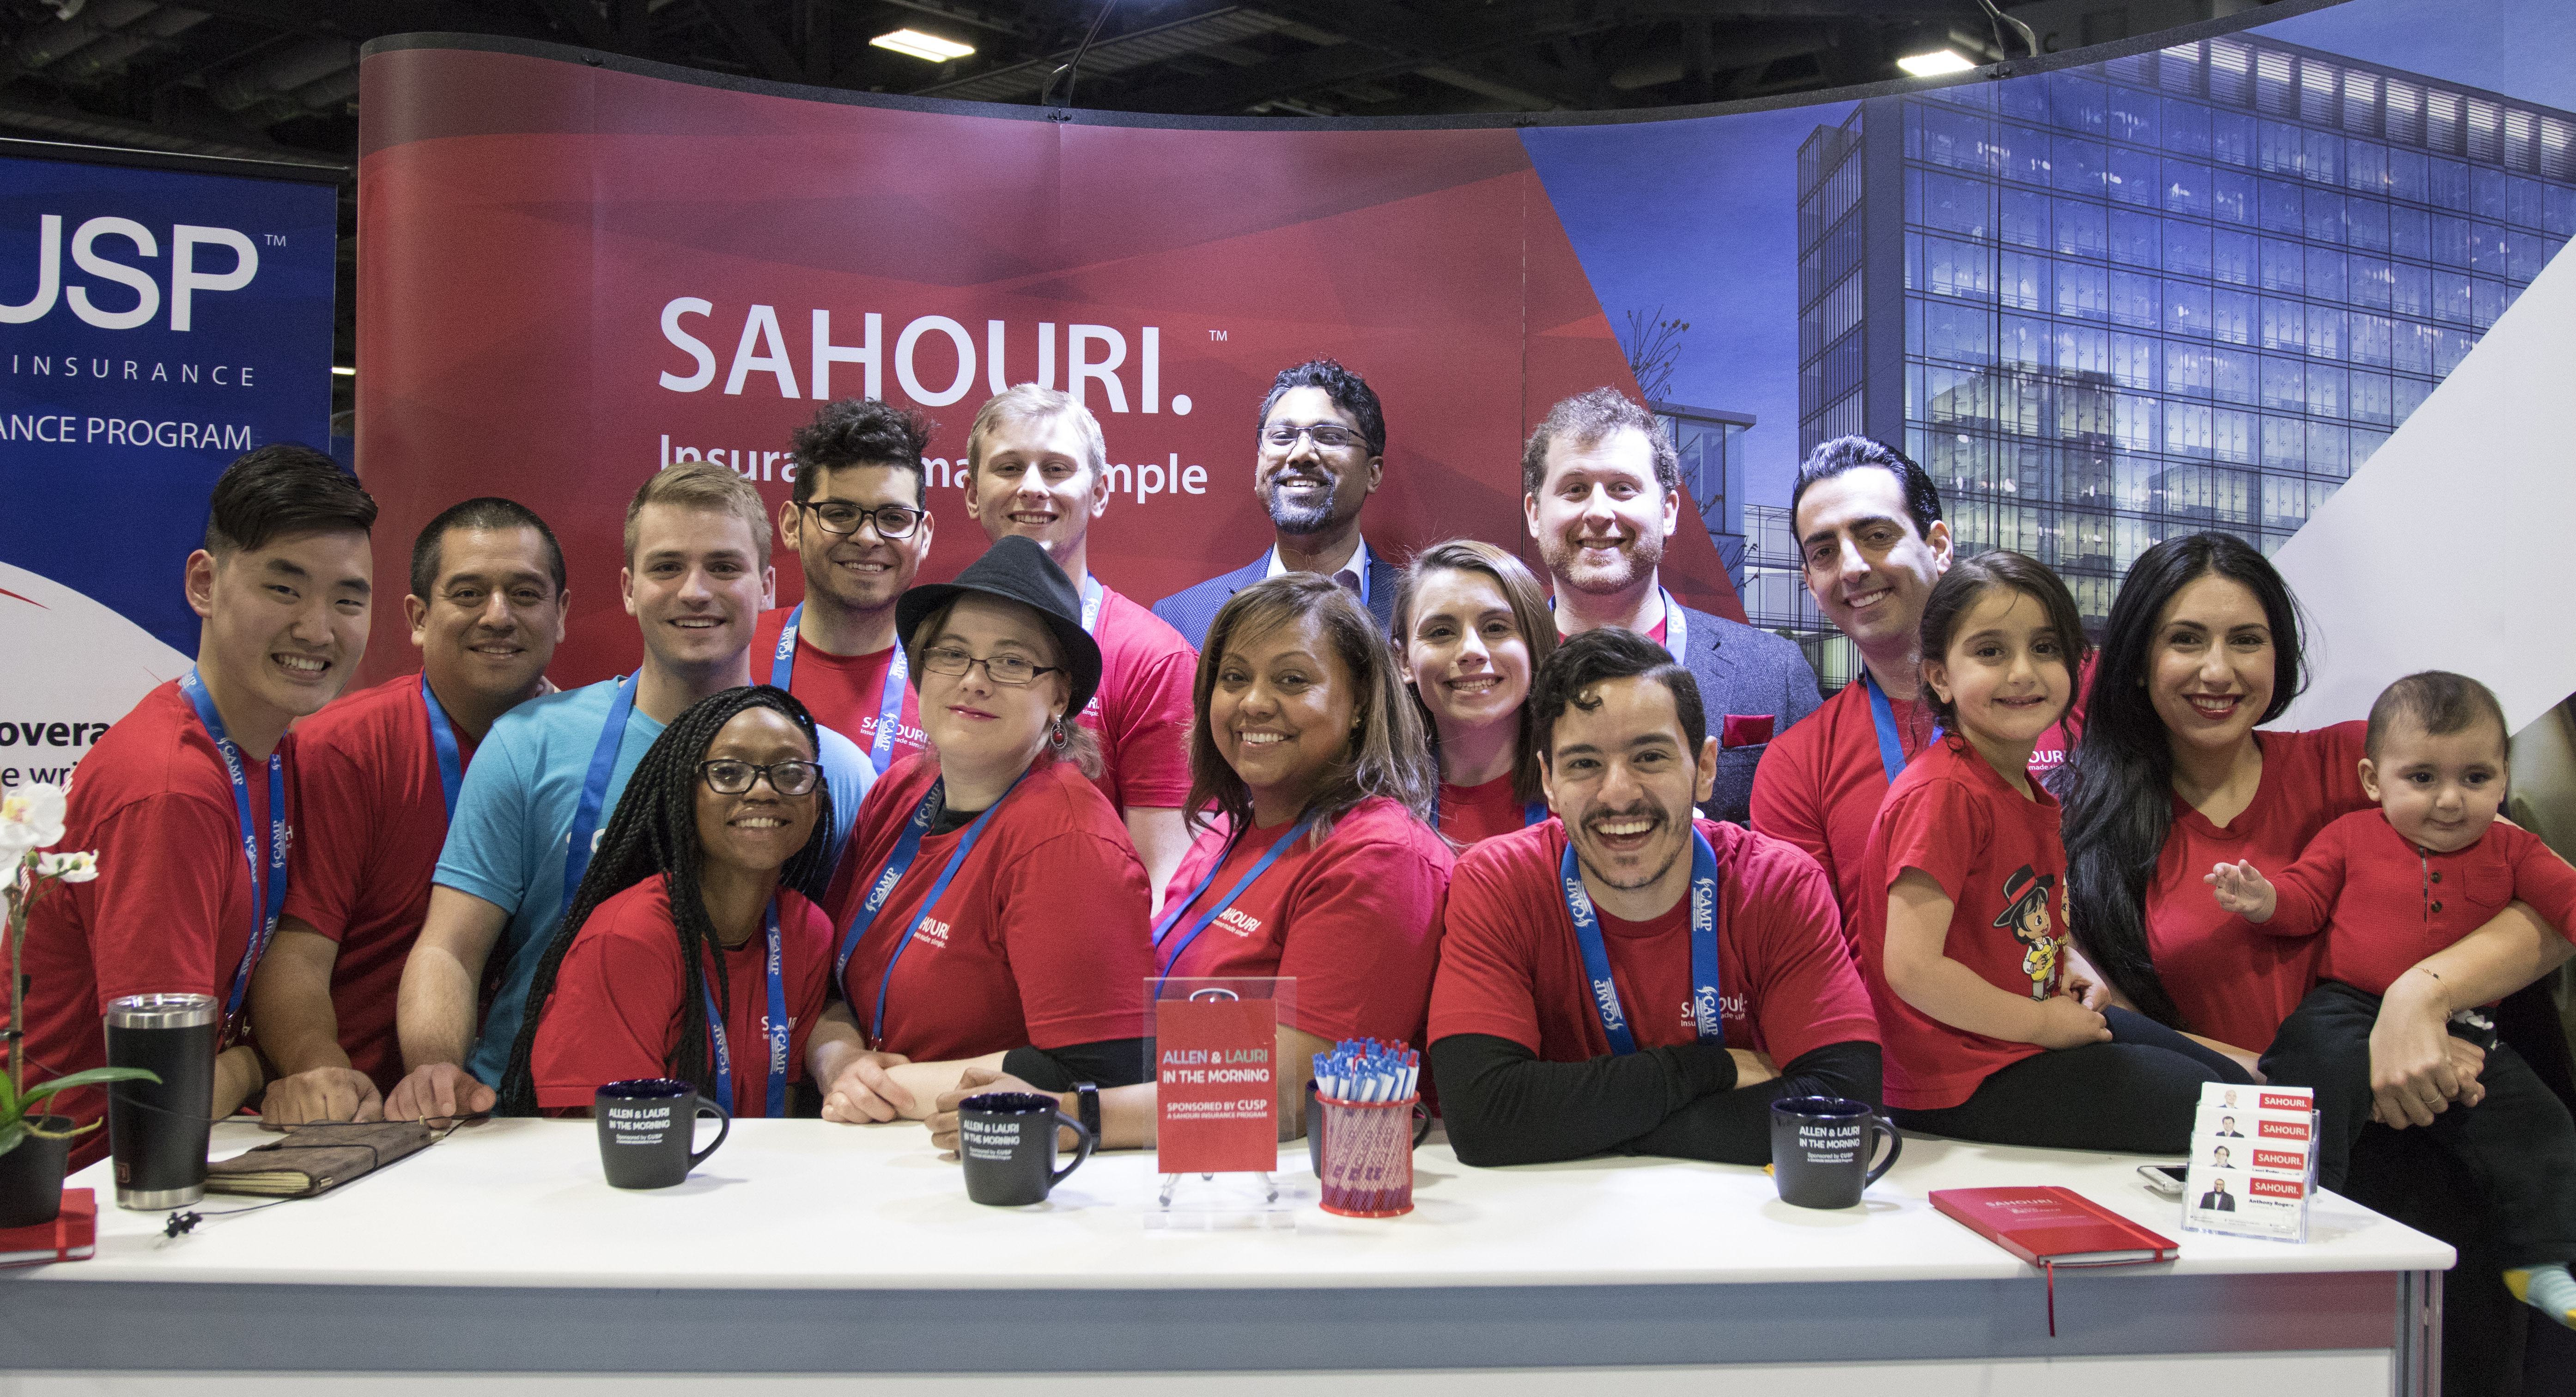 2018-wmccai-conference-and-expo-sahouri-team